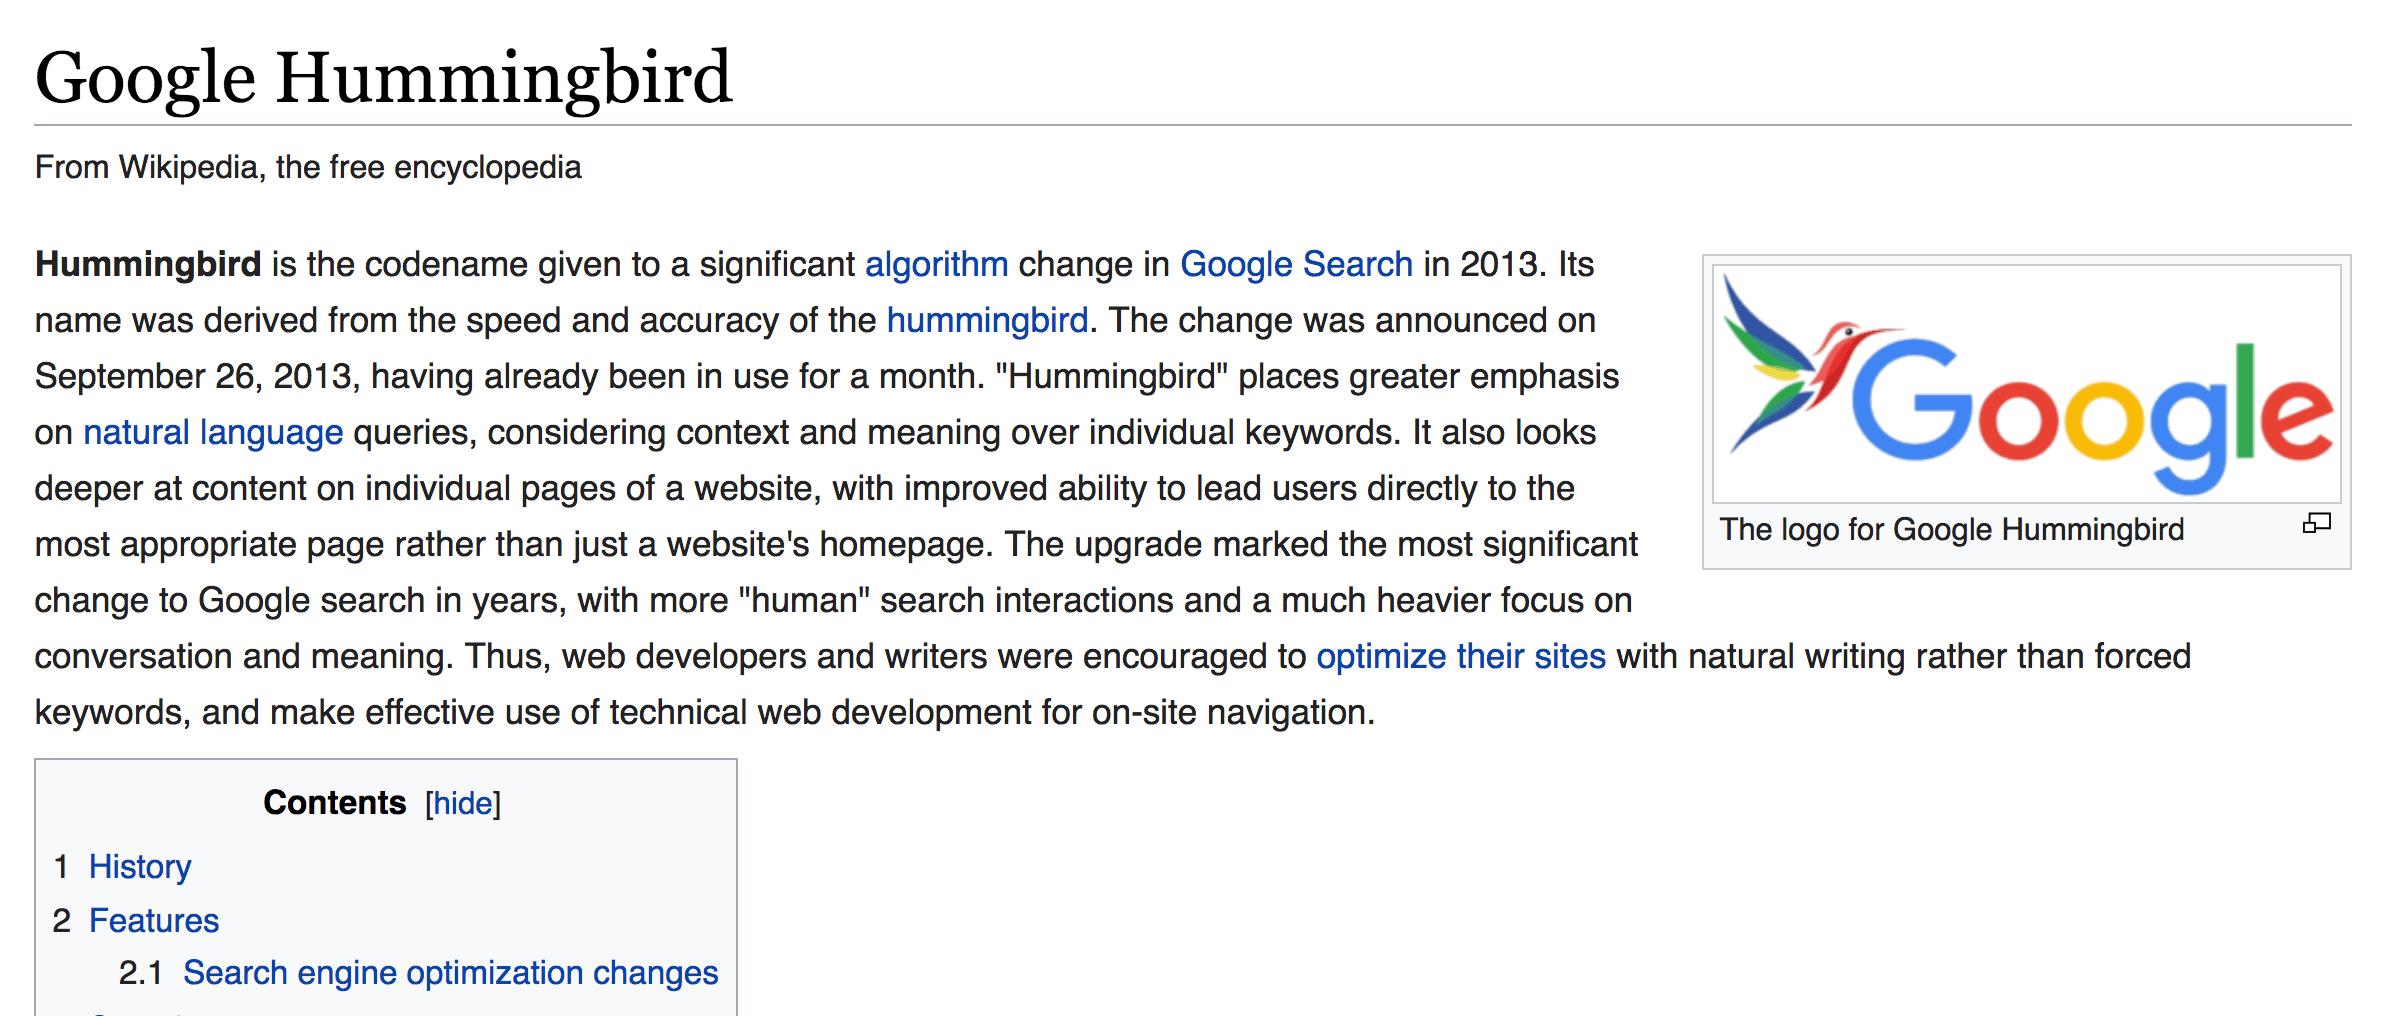 Google Hummingbird Wiki